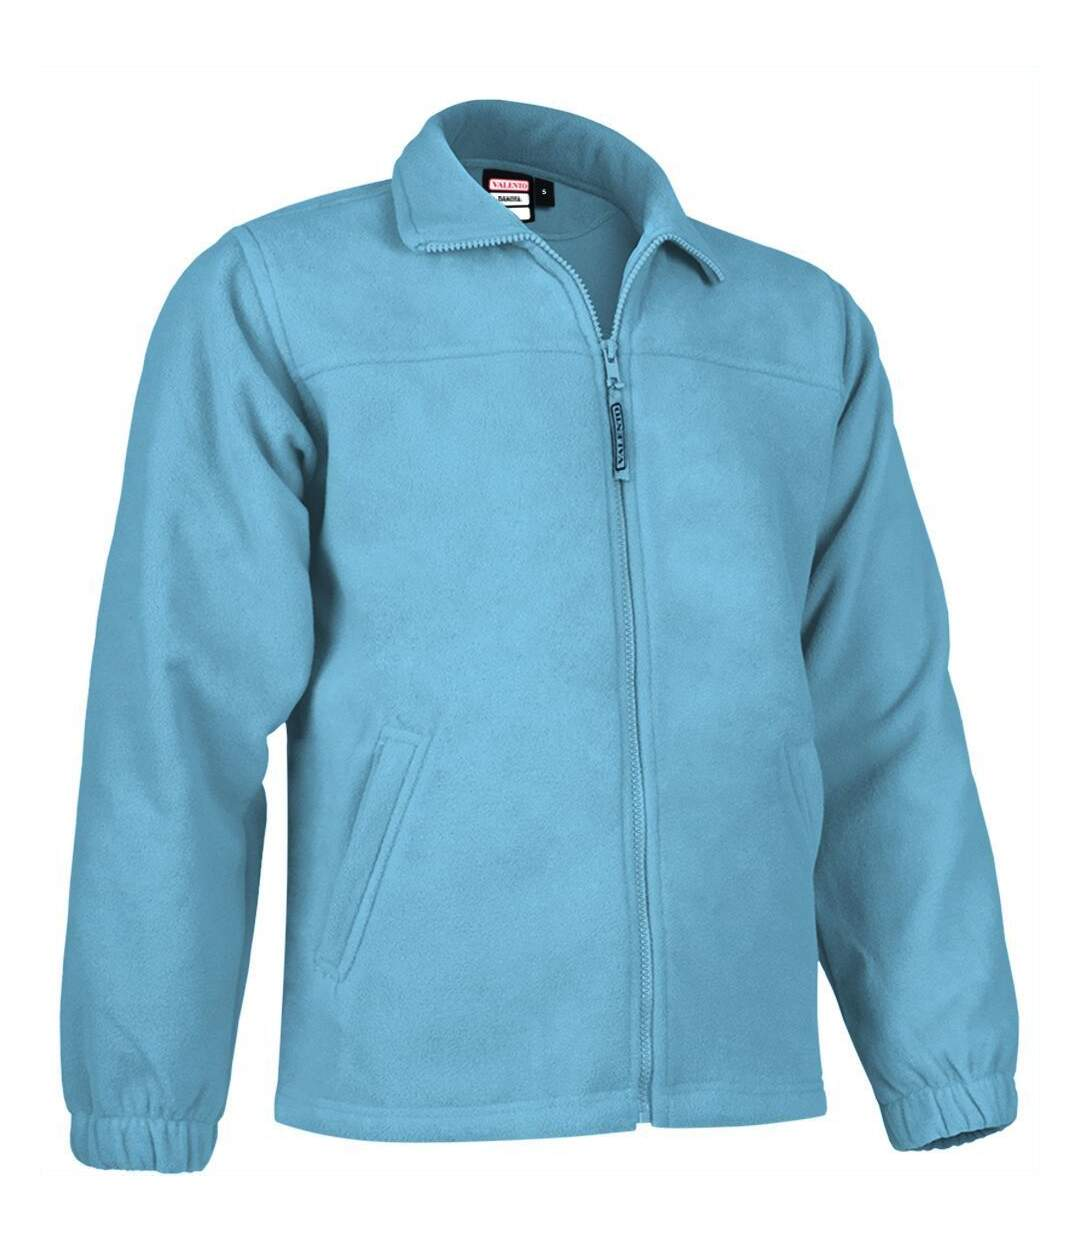 Veste polaire zippée - Homme - REF DAKOTA - bleu ciel